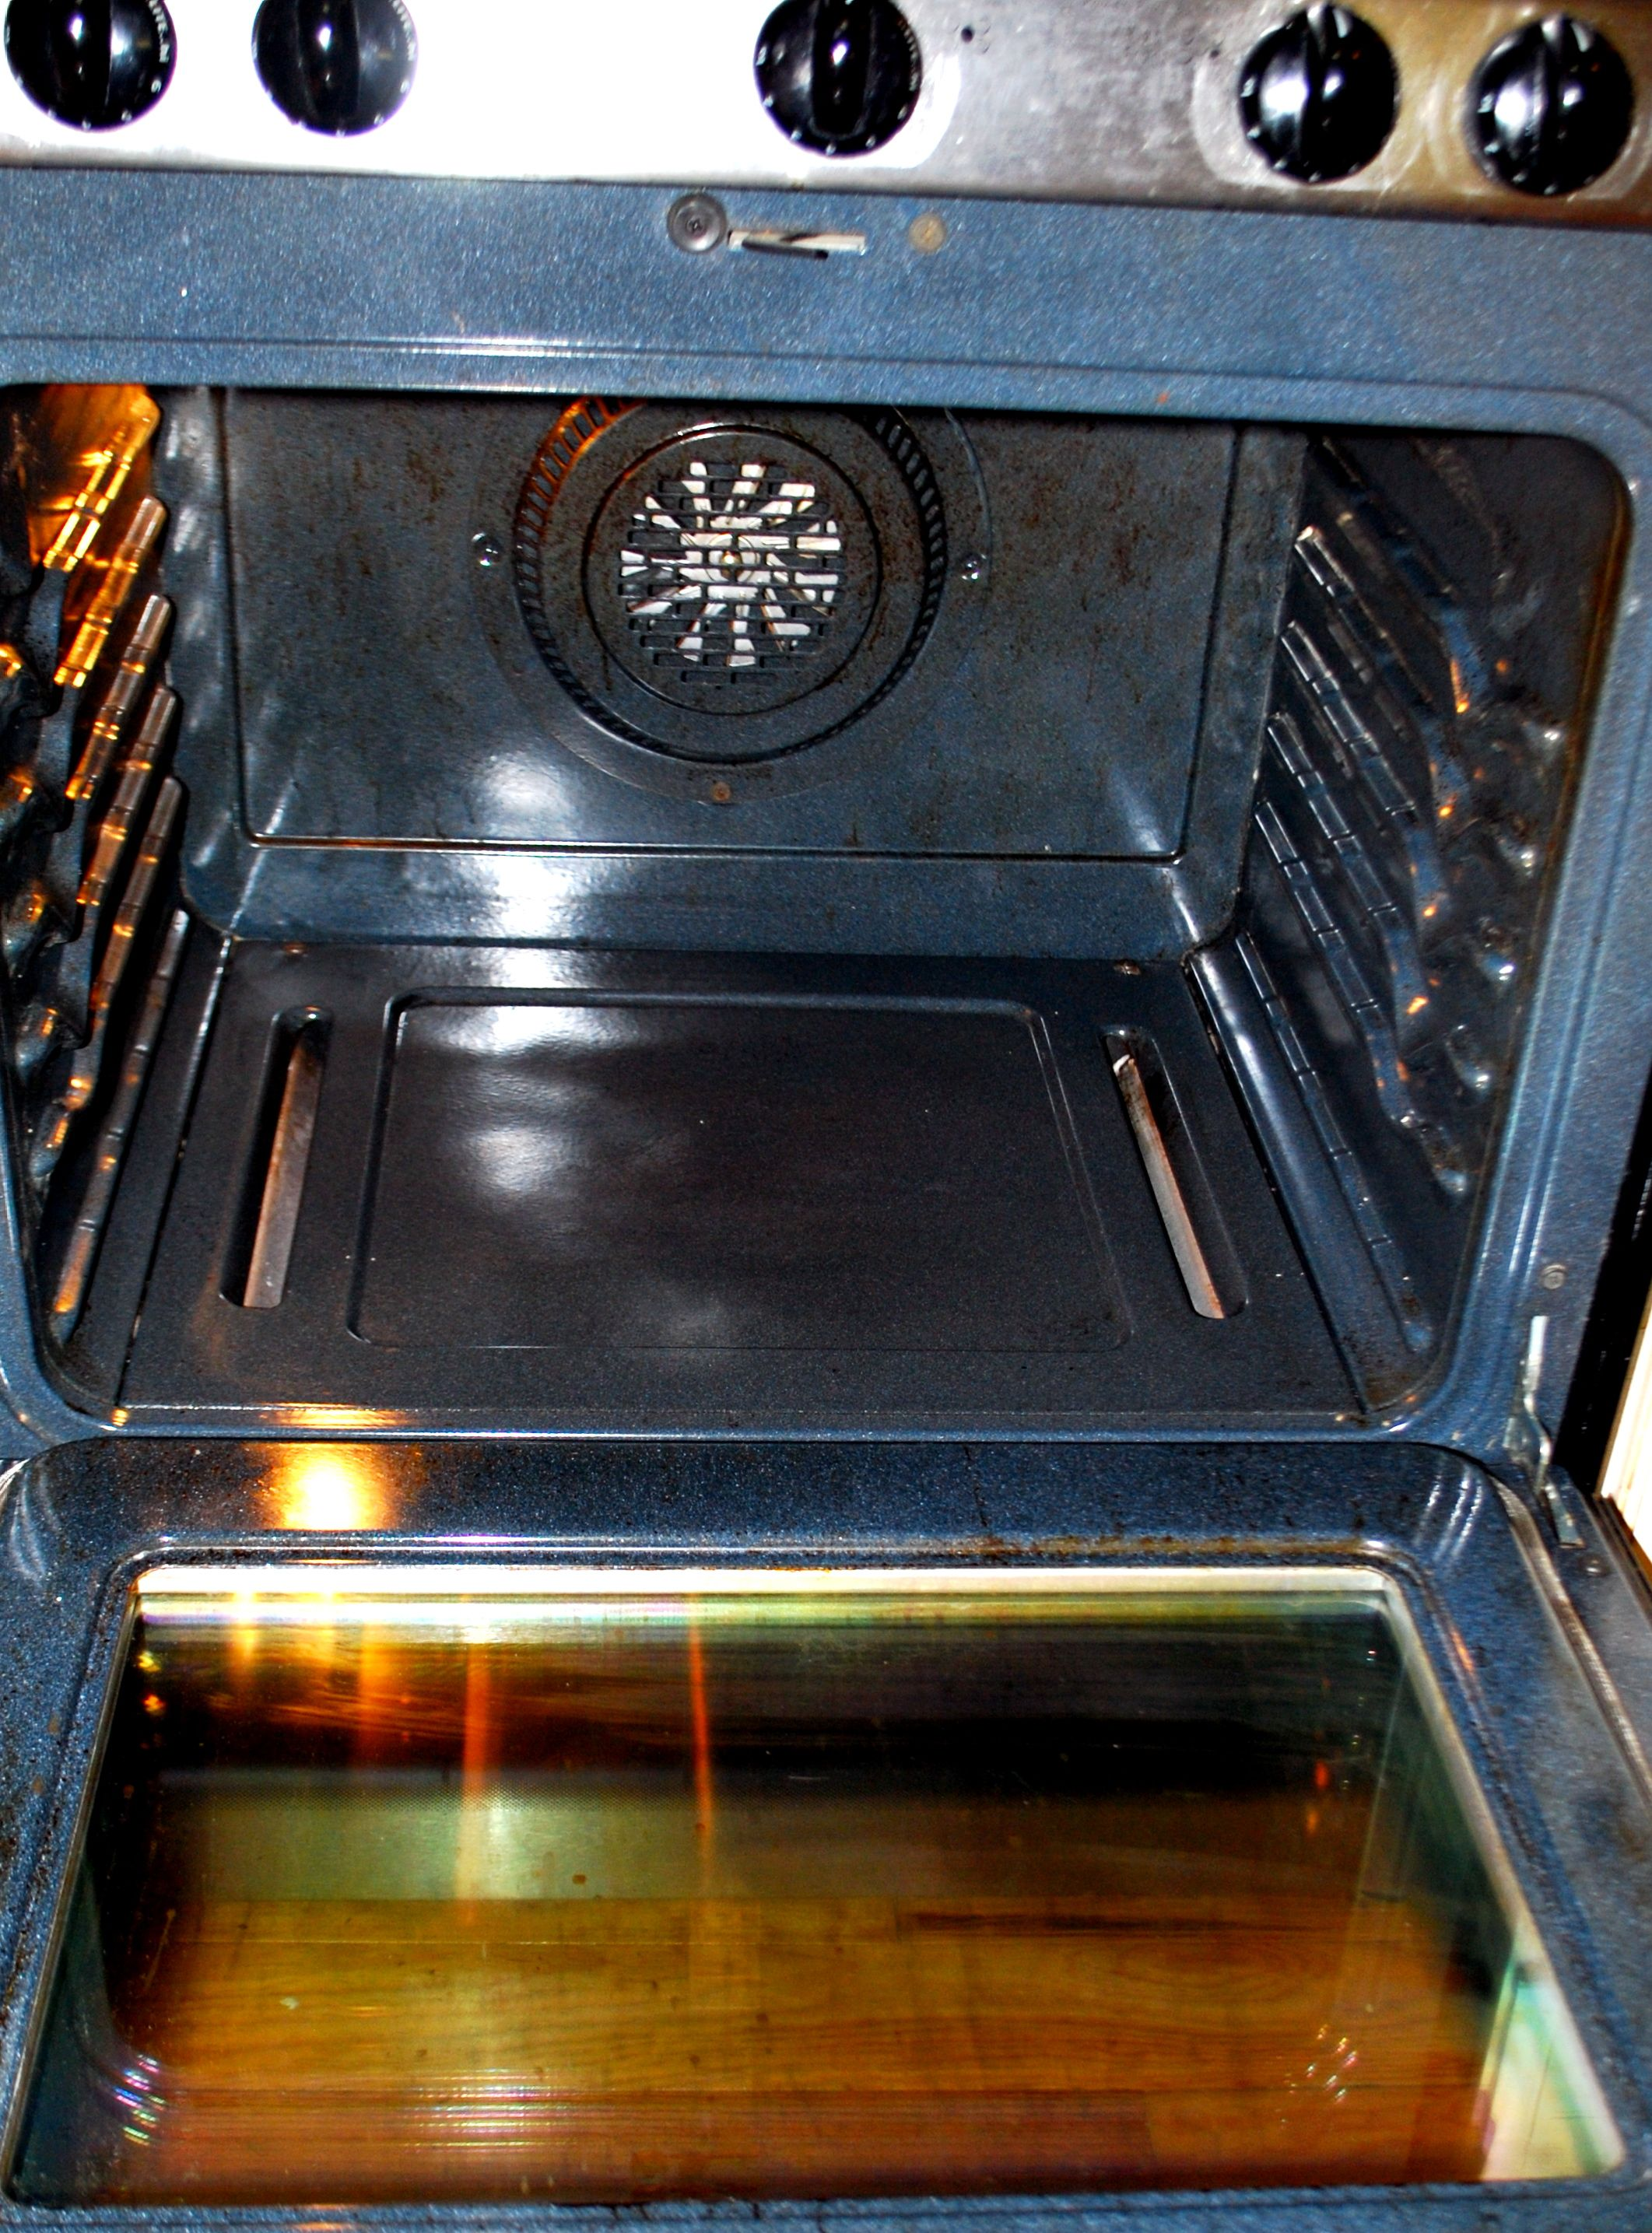 diy oven cleaner baking soda, Dawn and vinegar Diy